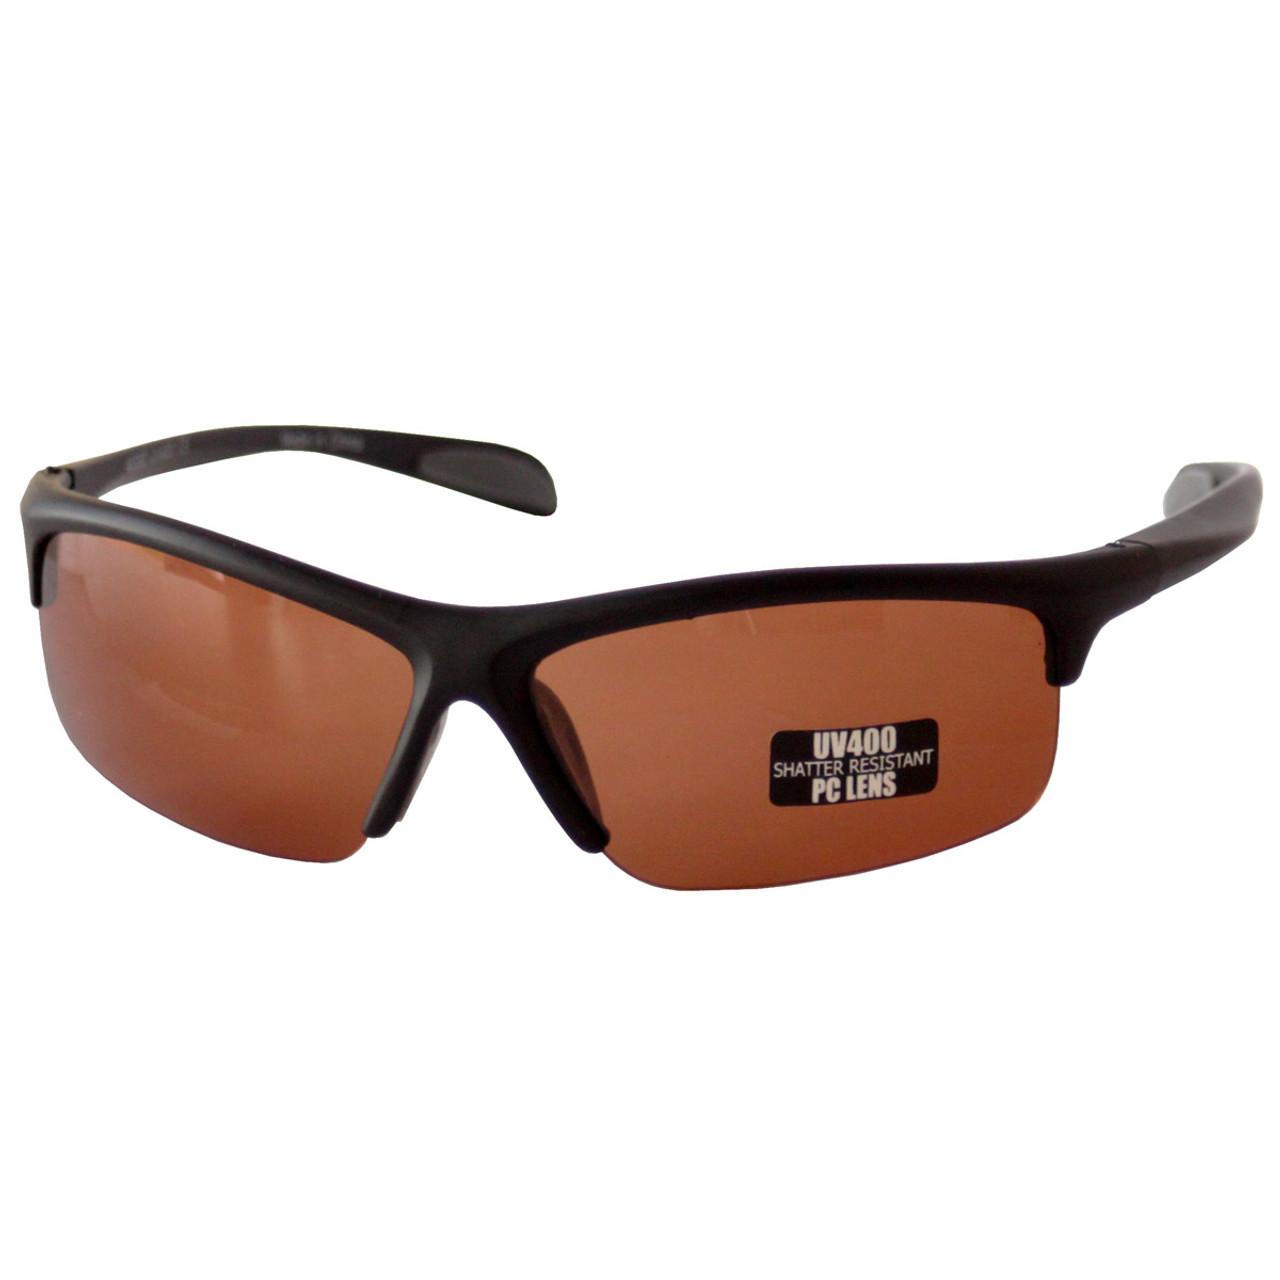 9188d3d4ae Tanel 360 T7 Baseball Softball Sunglasses - Tanel 360